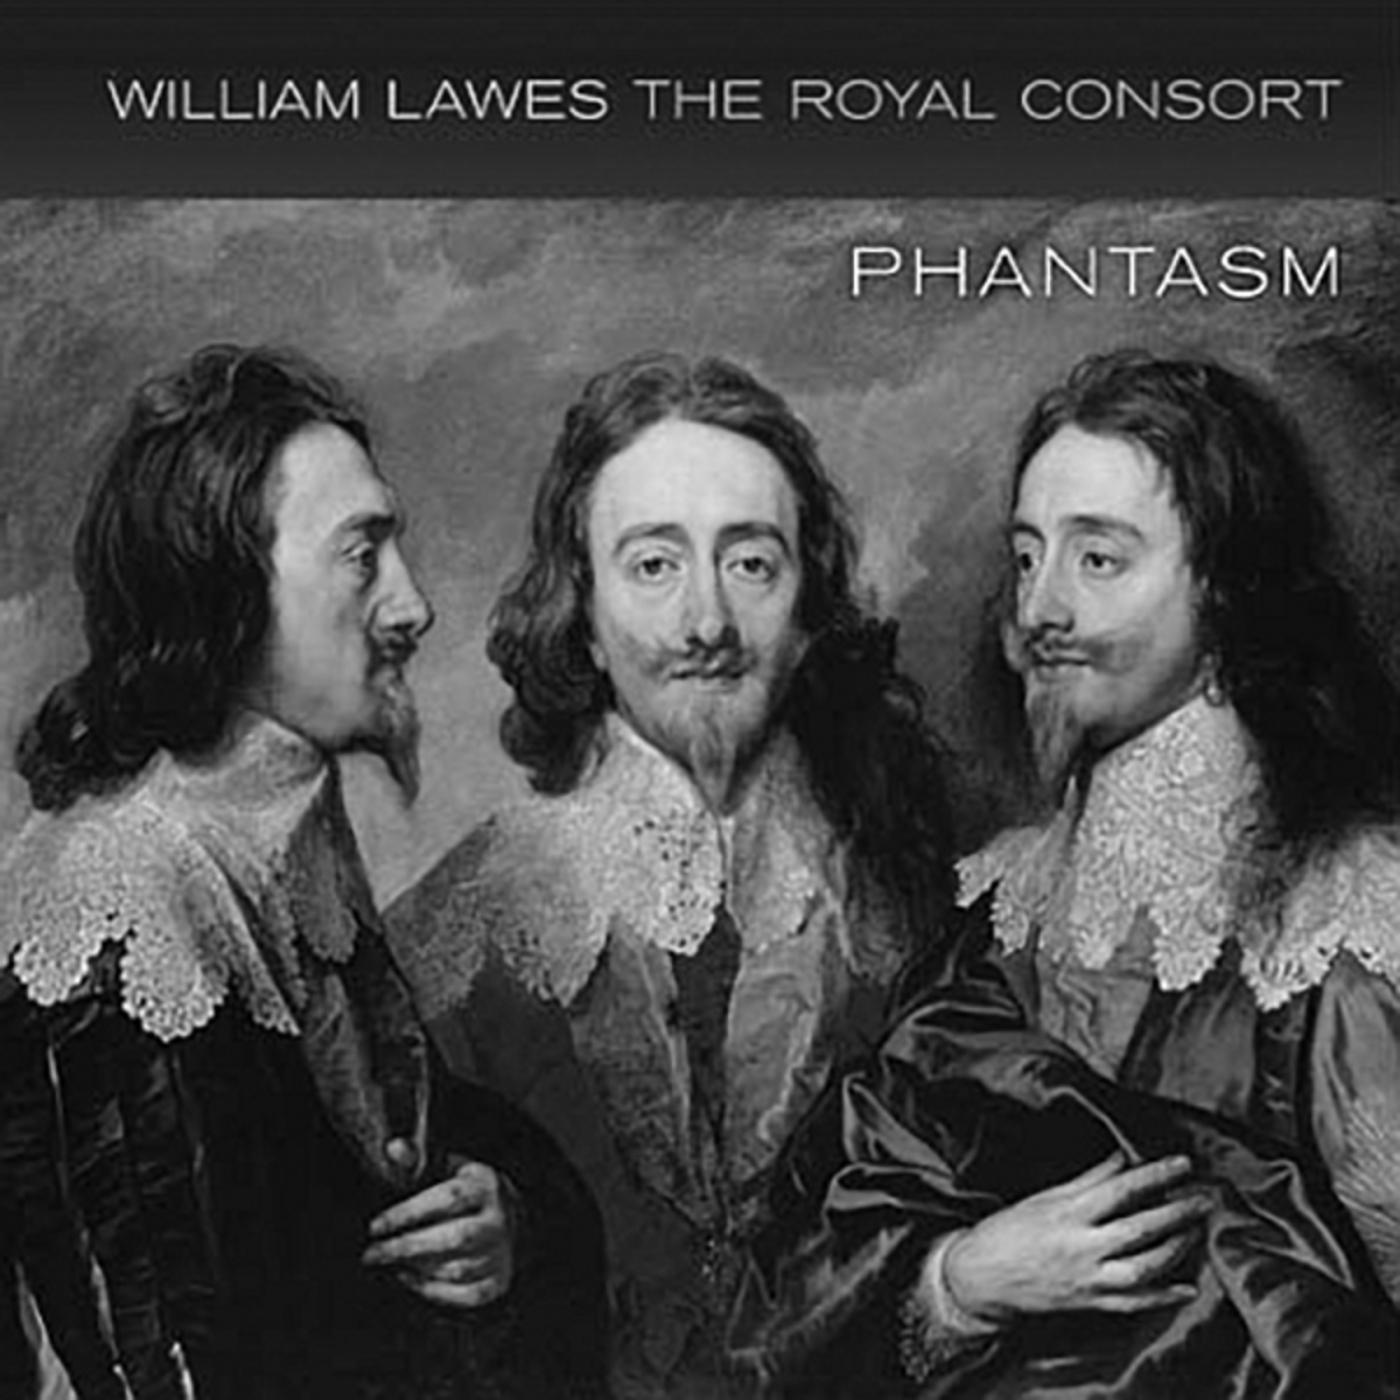 william_lawes_royal_consort_phantasm2